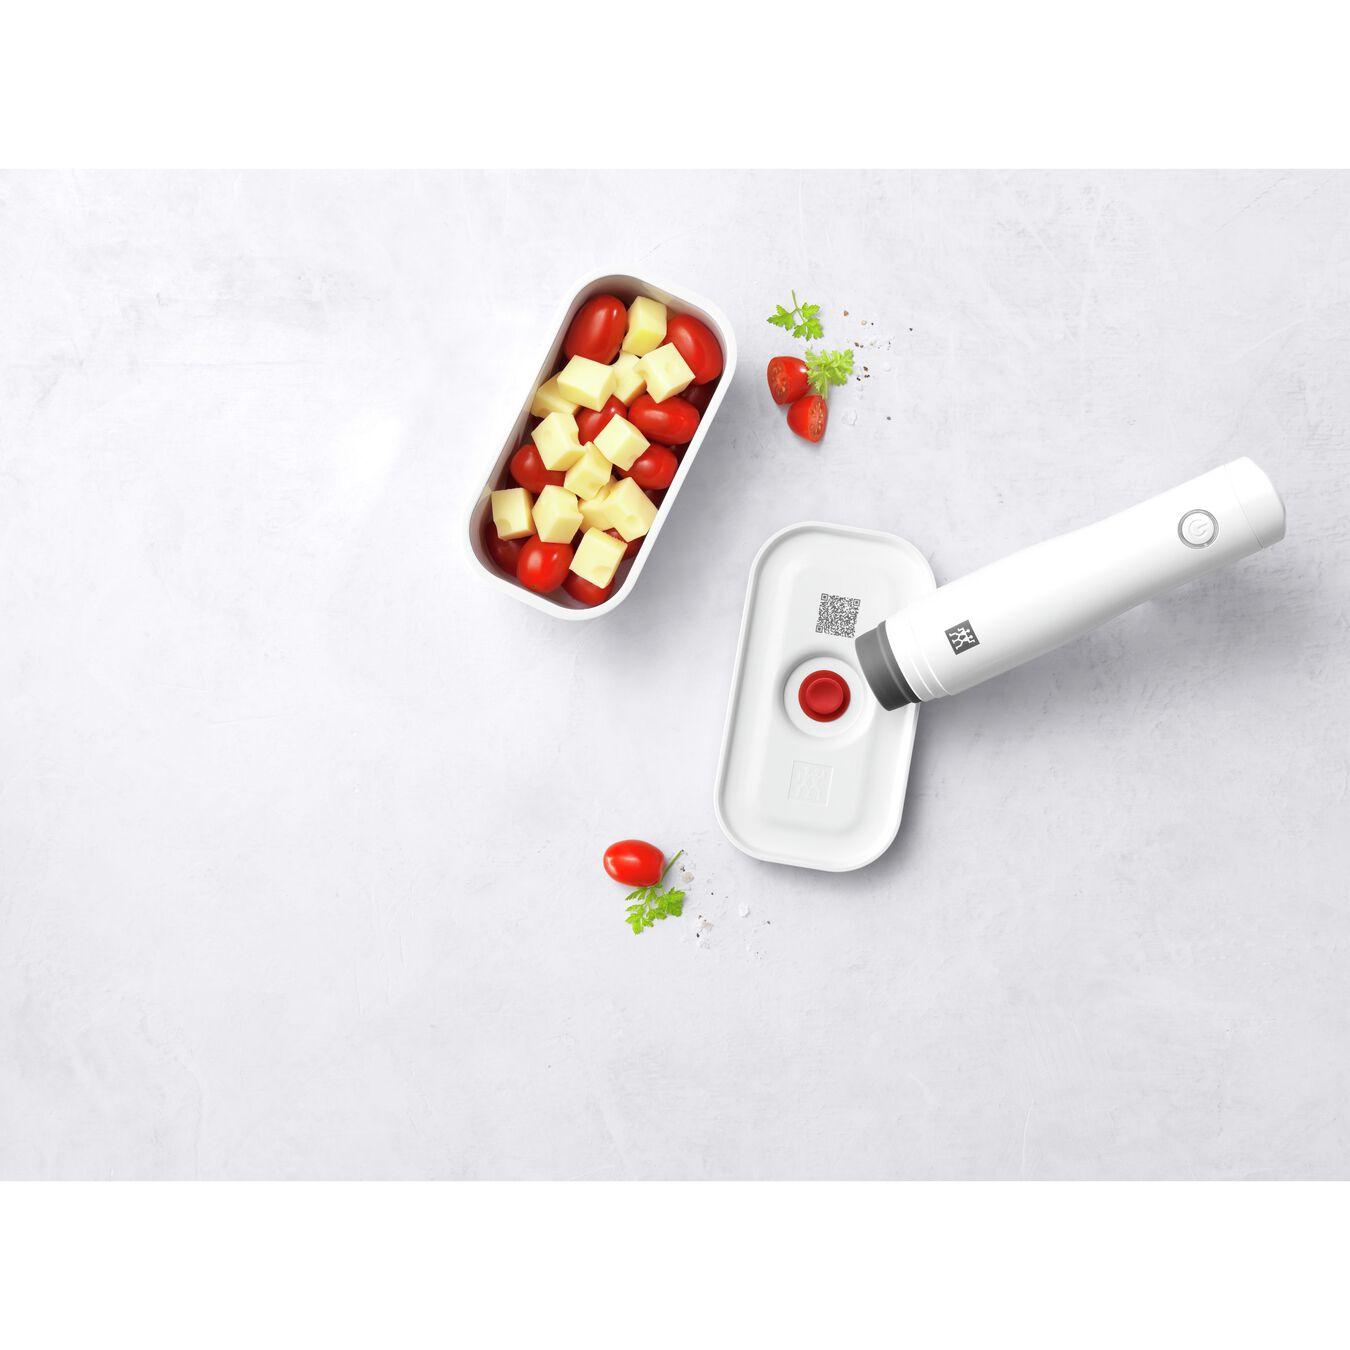 Vakuum Lunchbox, S, Kunststoff, Weiß-Rot,,large 5